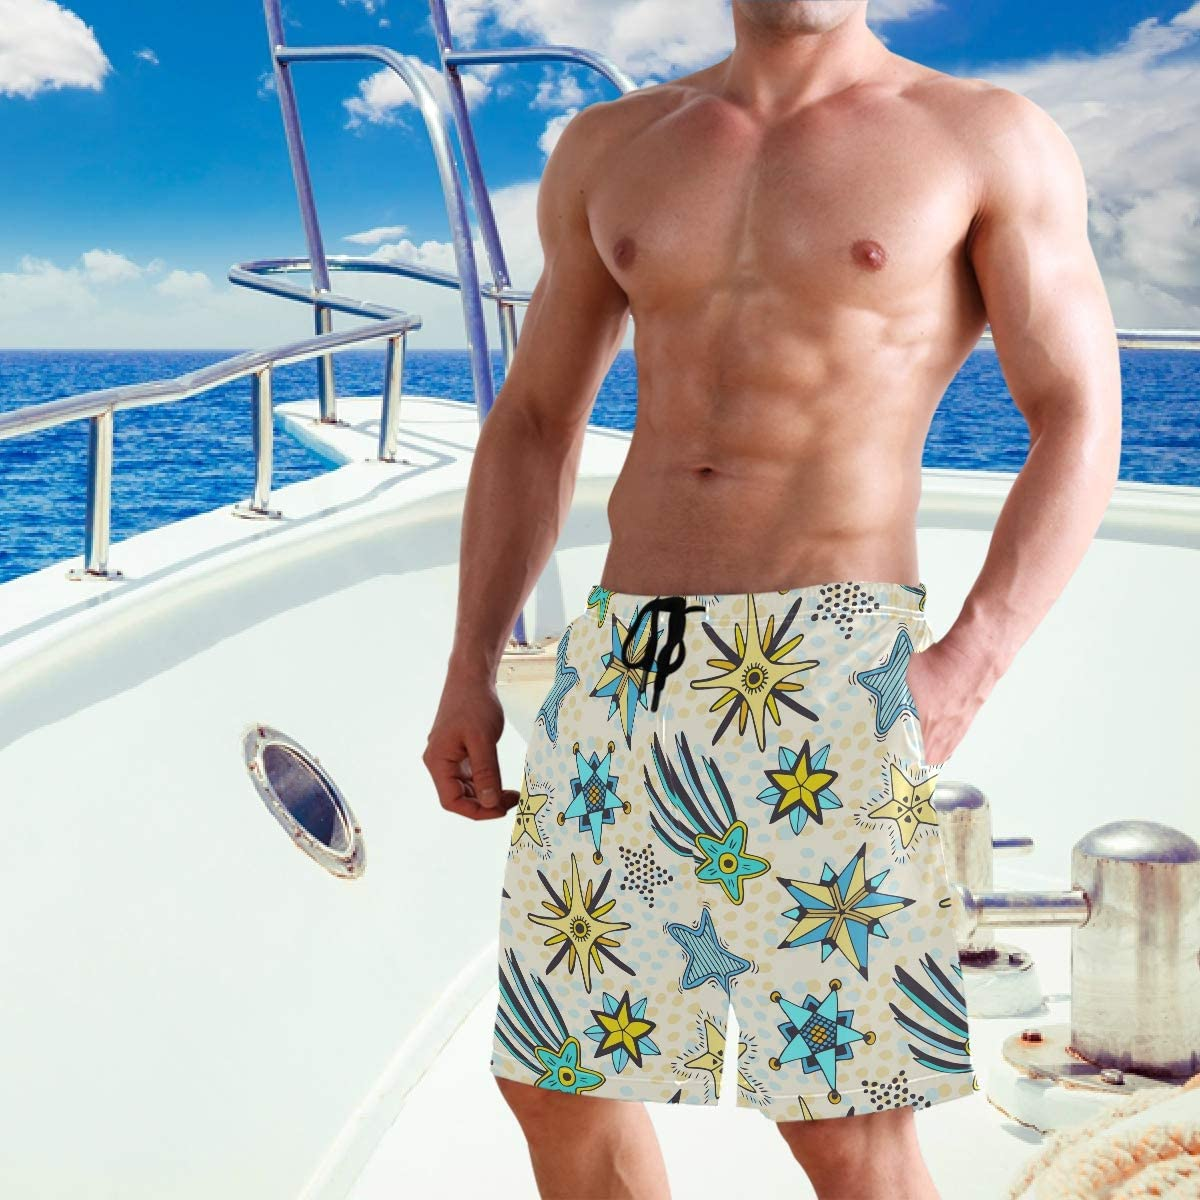 RunningBear Men's Swim Trunks - Stars Abstract Doodle Cartoon Beach Short Men Quick Dry Bathing Suit Shorts